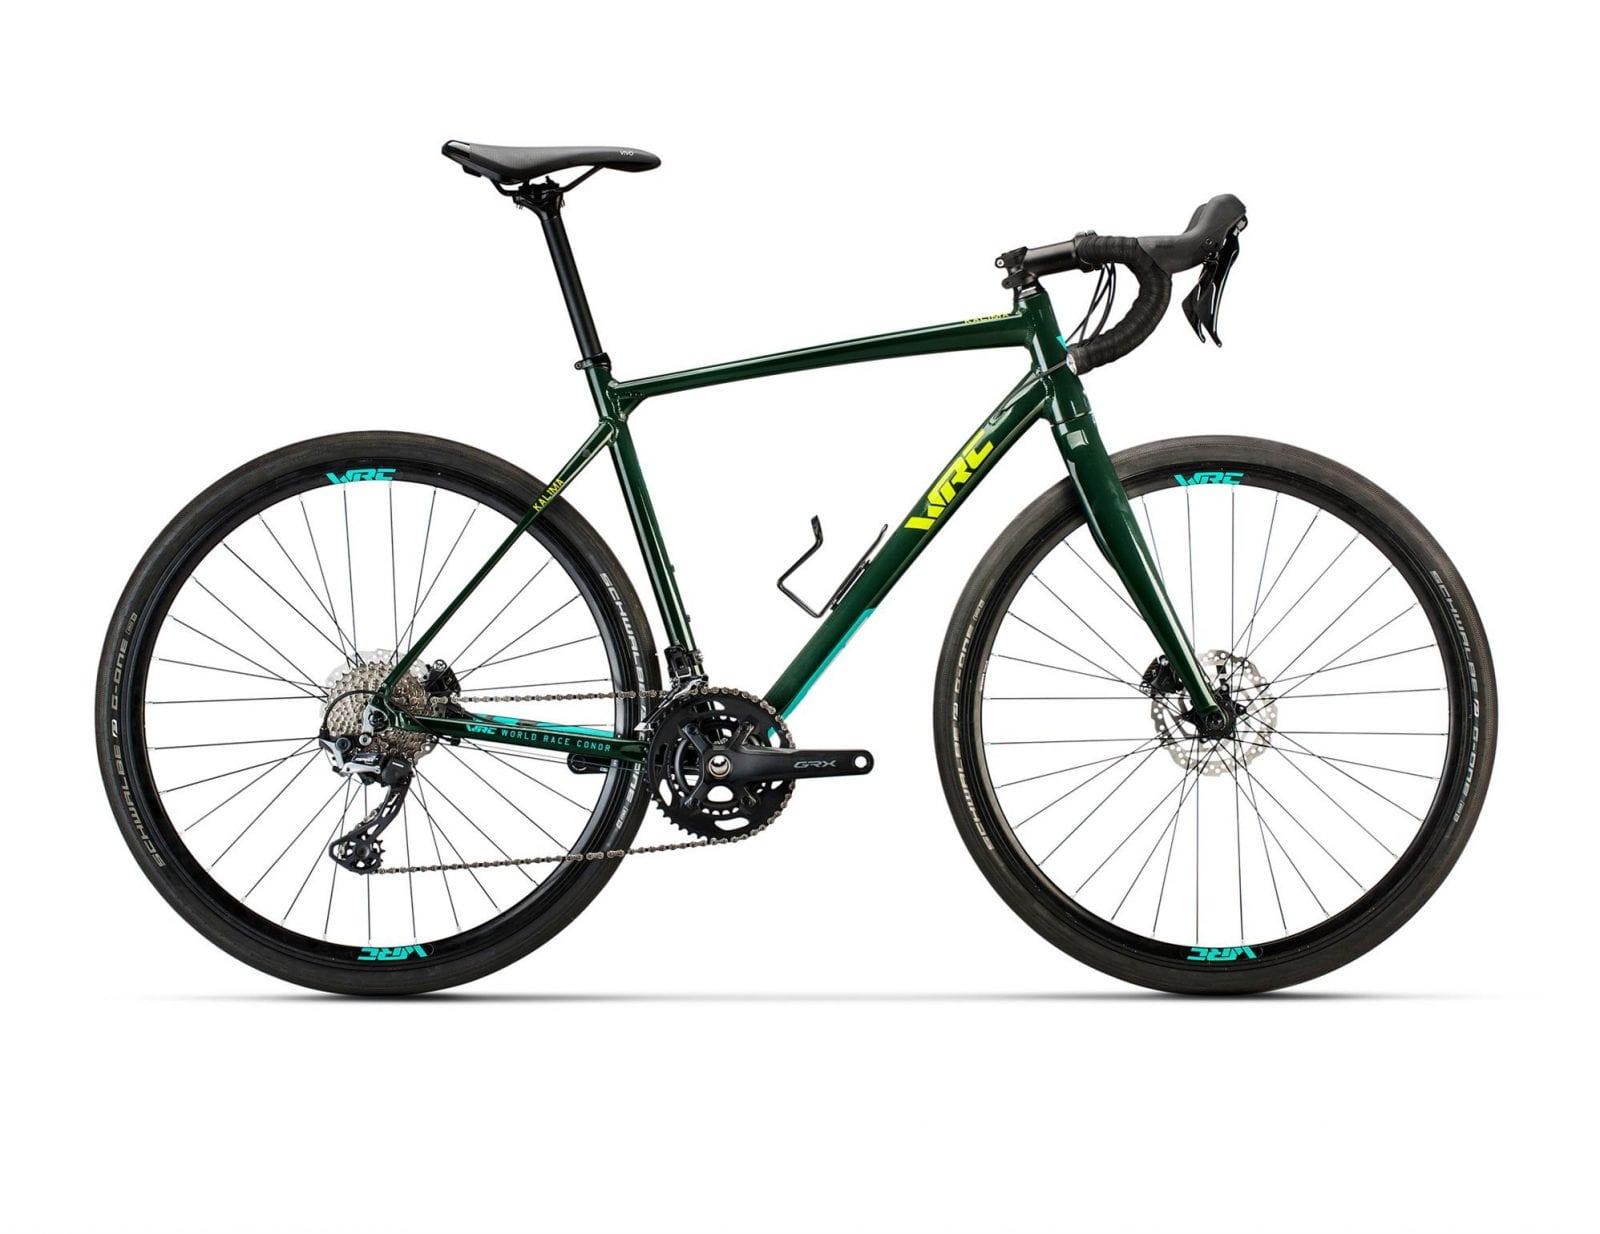 030435ngmd_0_vuk_bikes_bicicletas